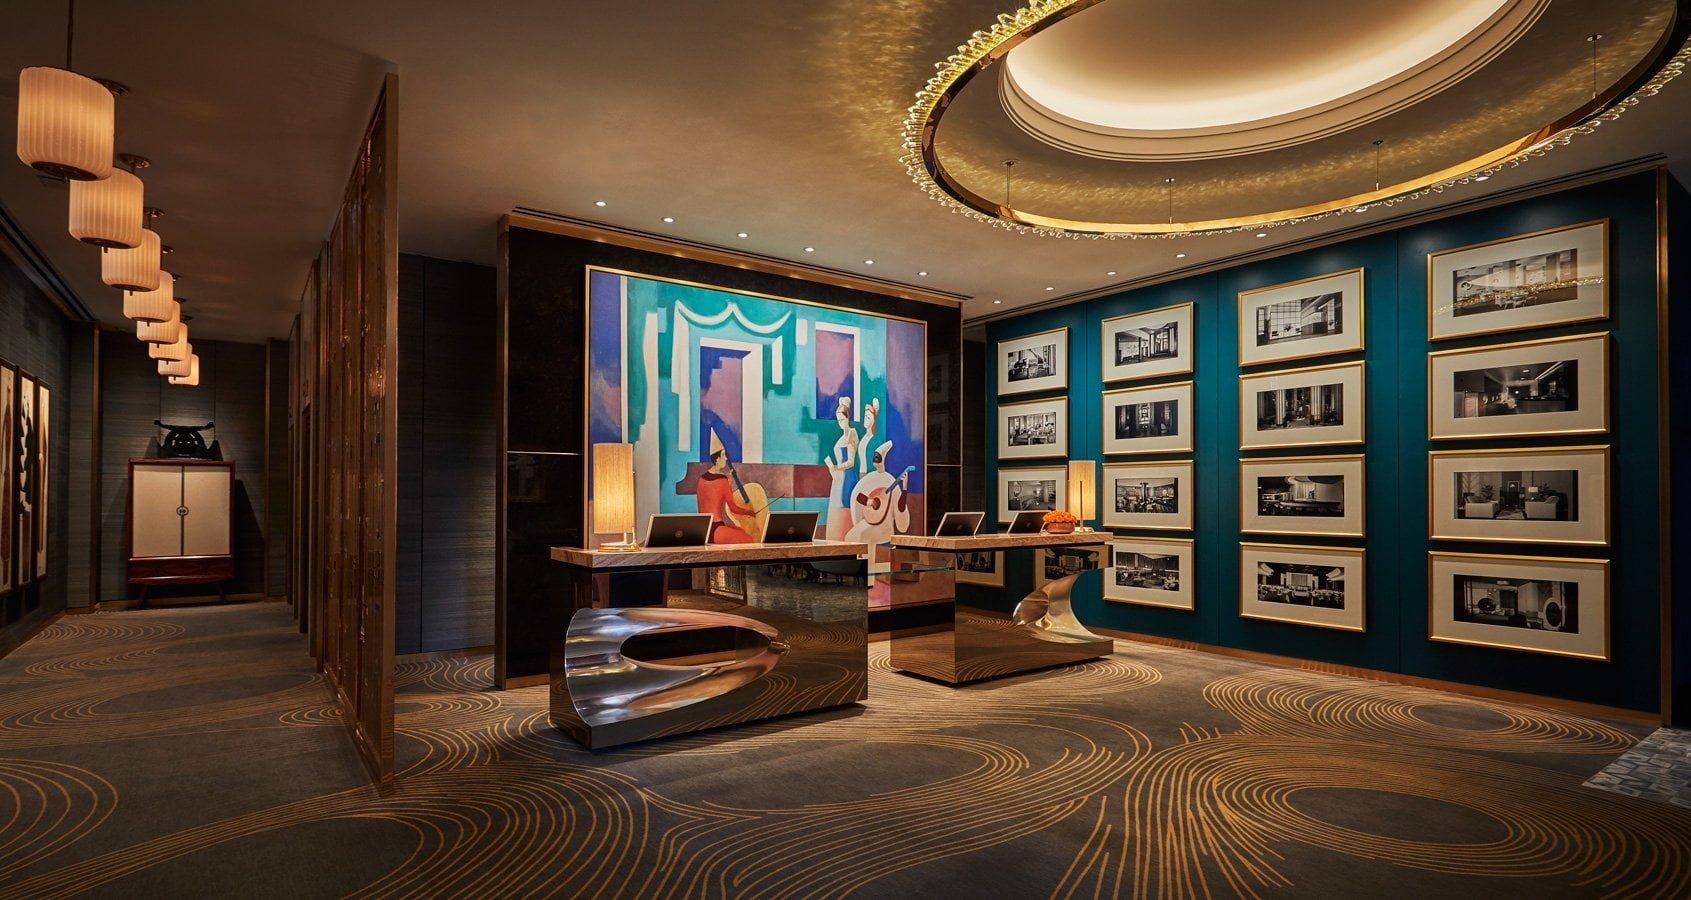 Viceroy chicago usa space international hotel design for Design hotel usa